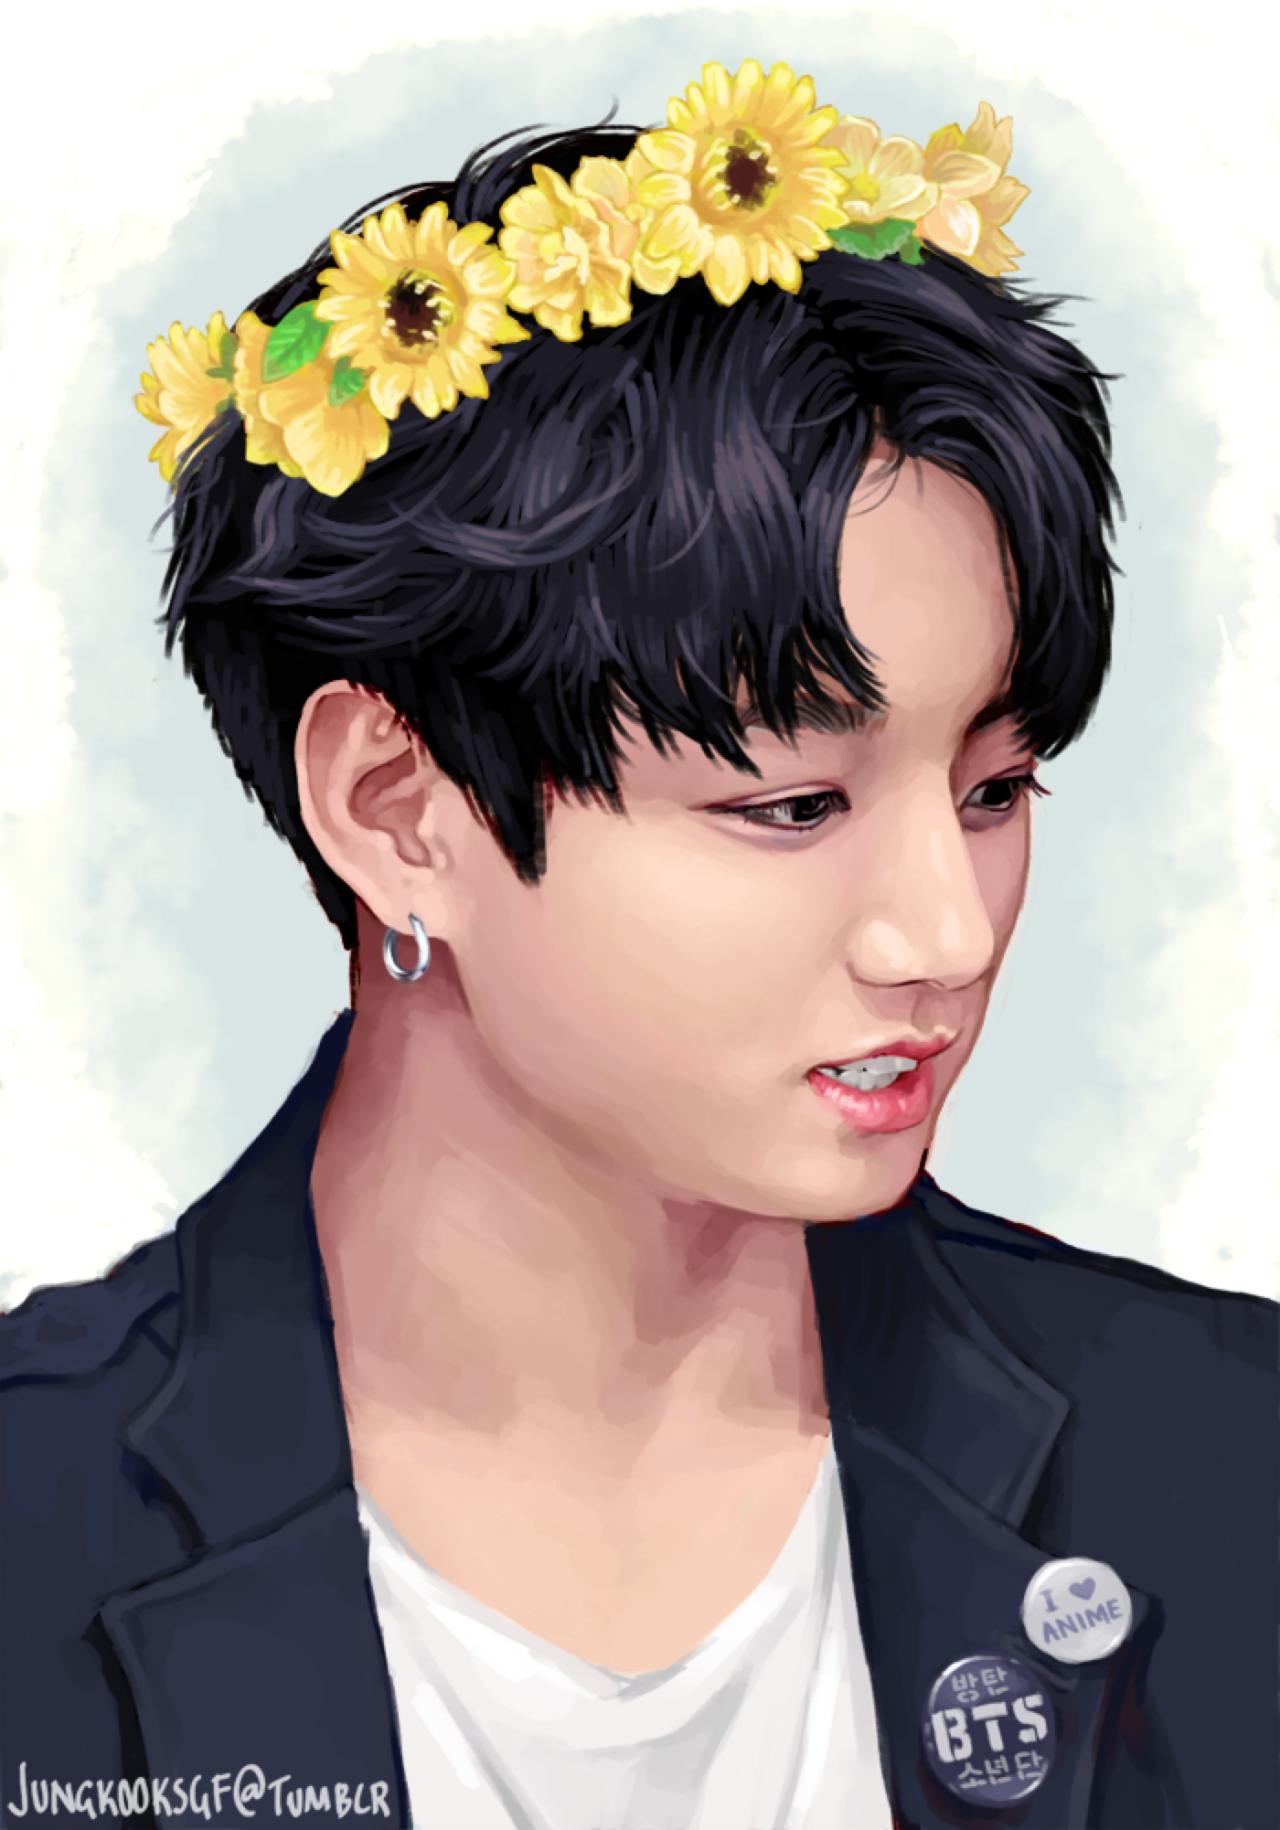 Jungkook Fanart BTS Fanart Pinterest Fanart, BTS and